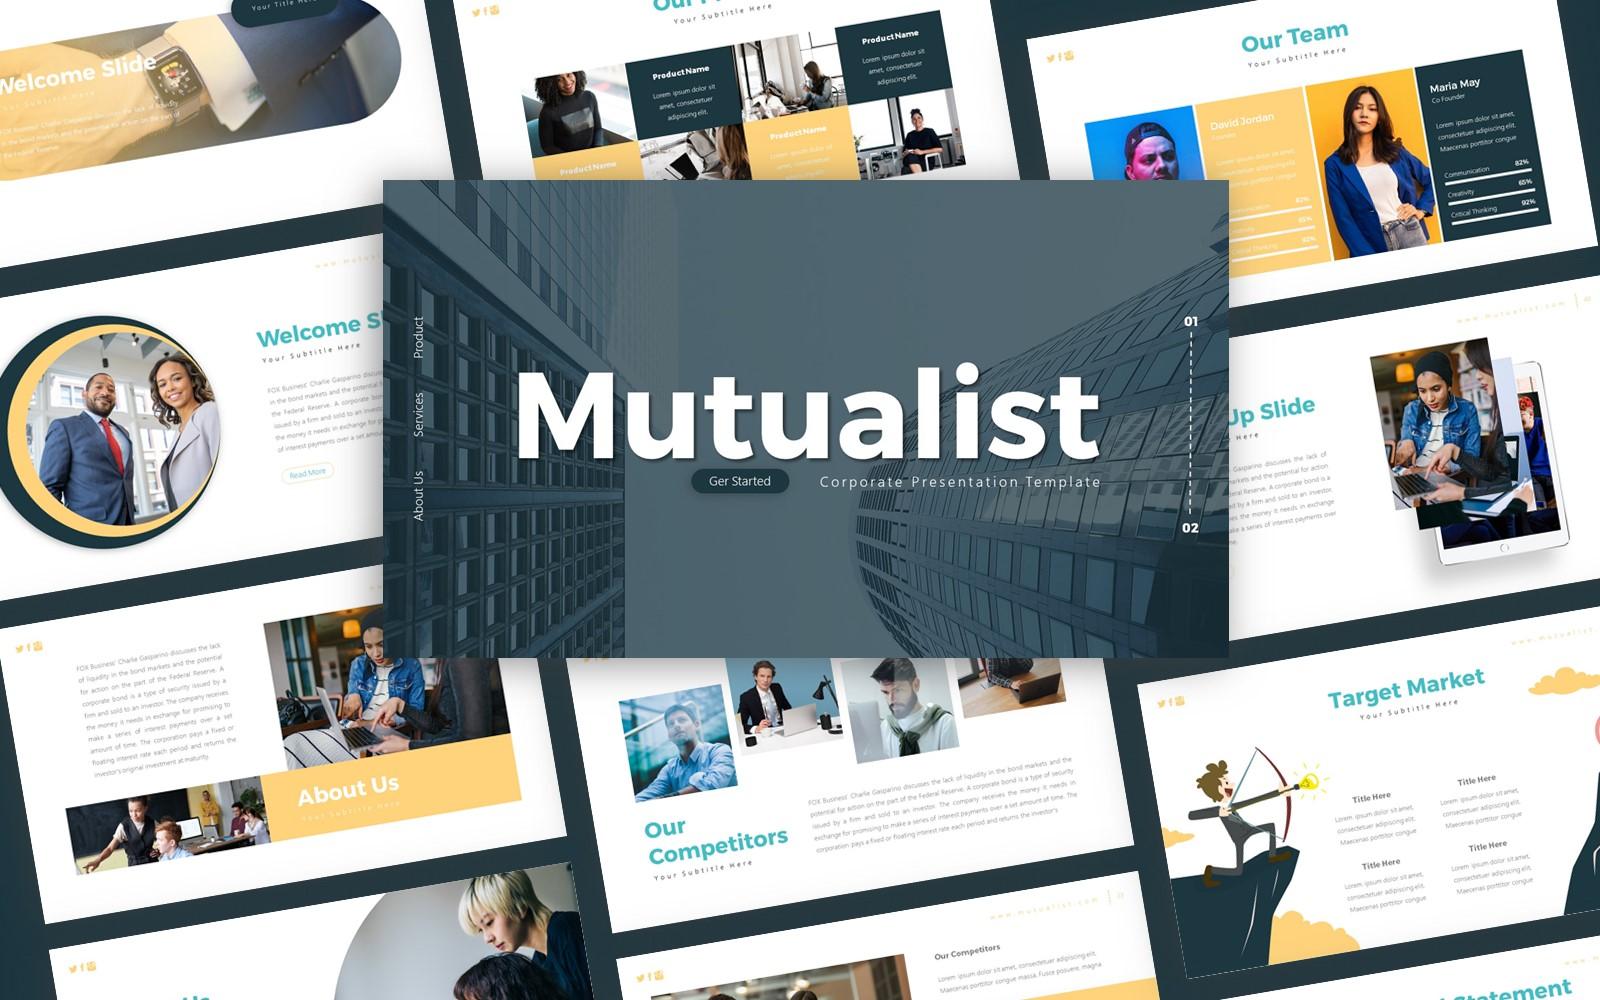 Mutualist Corporate Presentation PowerPoint Template